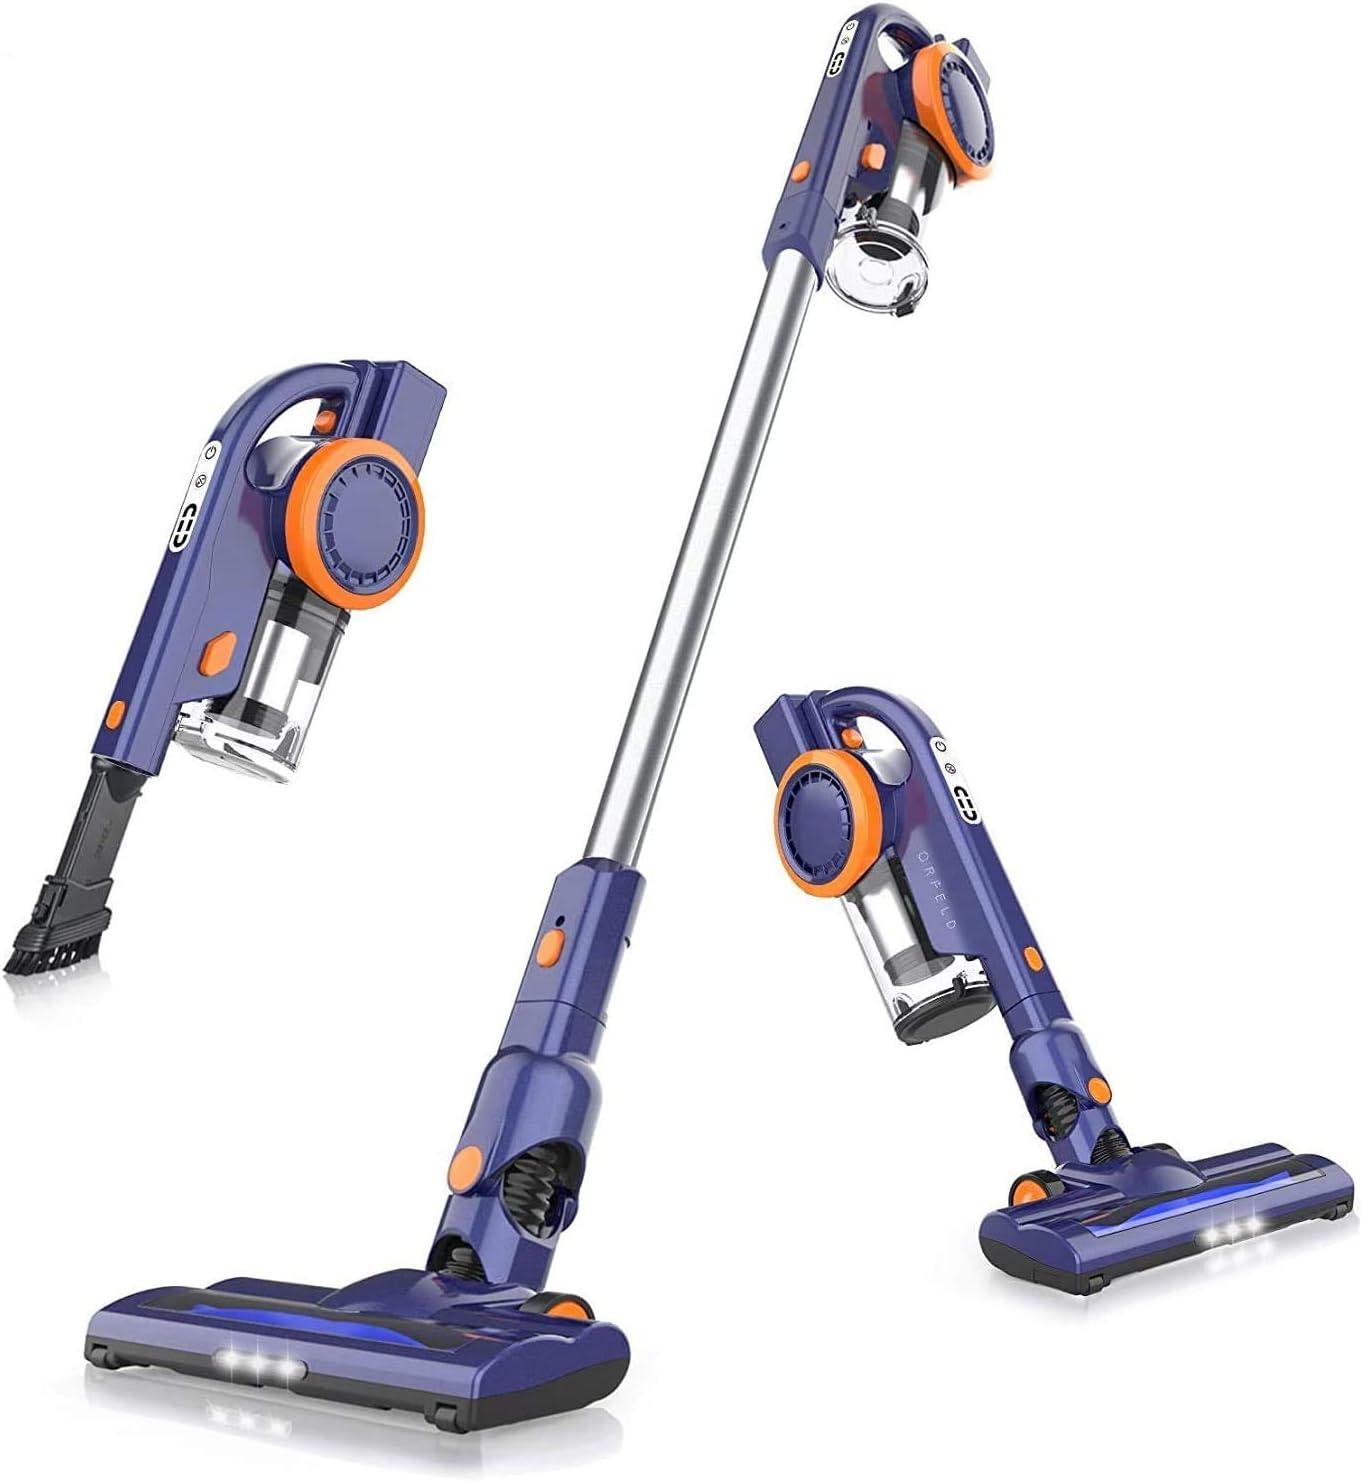 7. ORFELD EV679 Cordless Stick Vacuum Cleaner- Best Lightweight Vacuum Cleaner